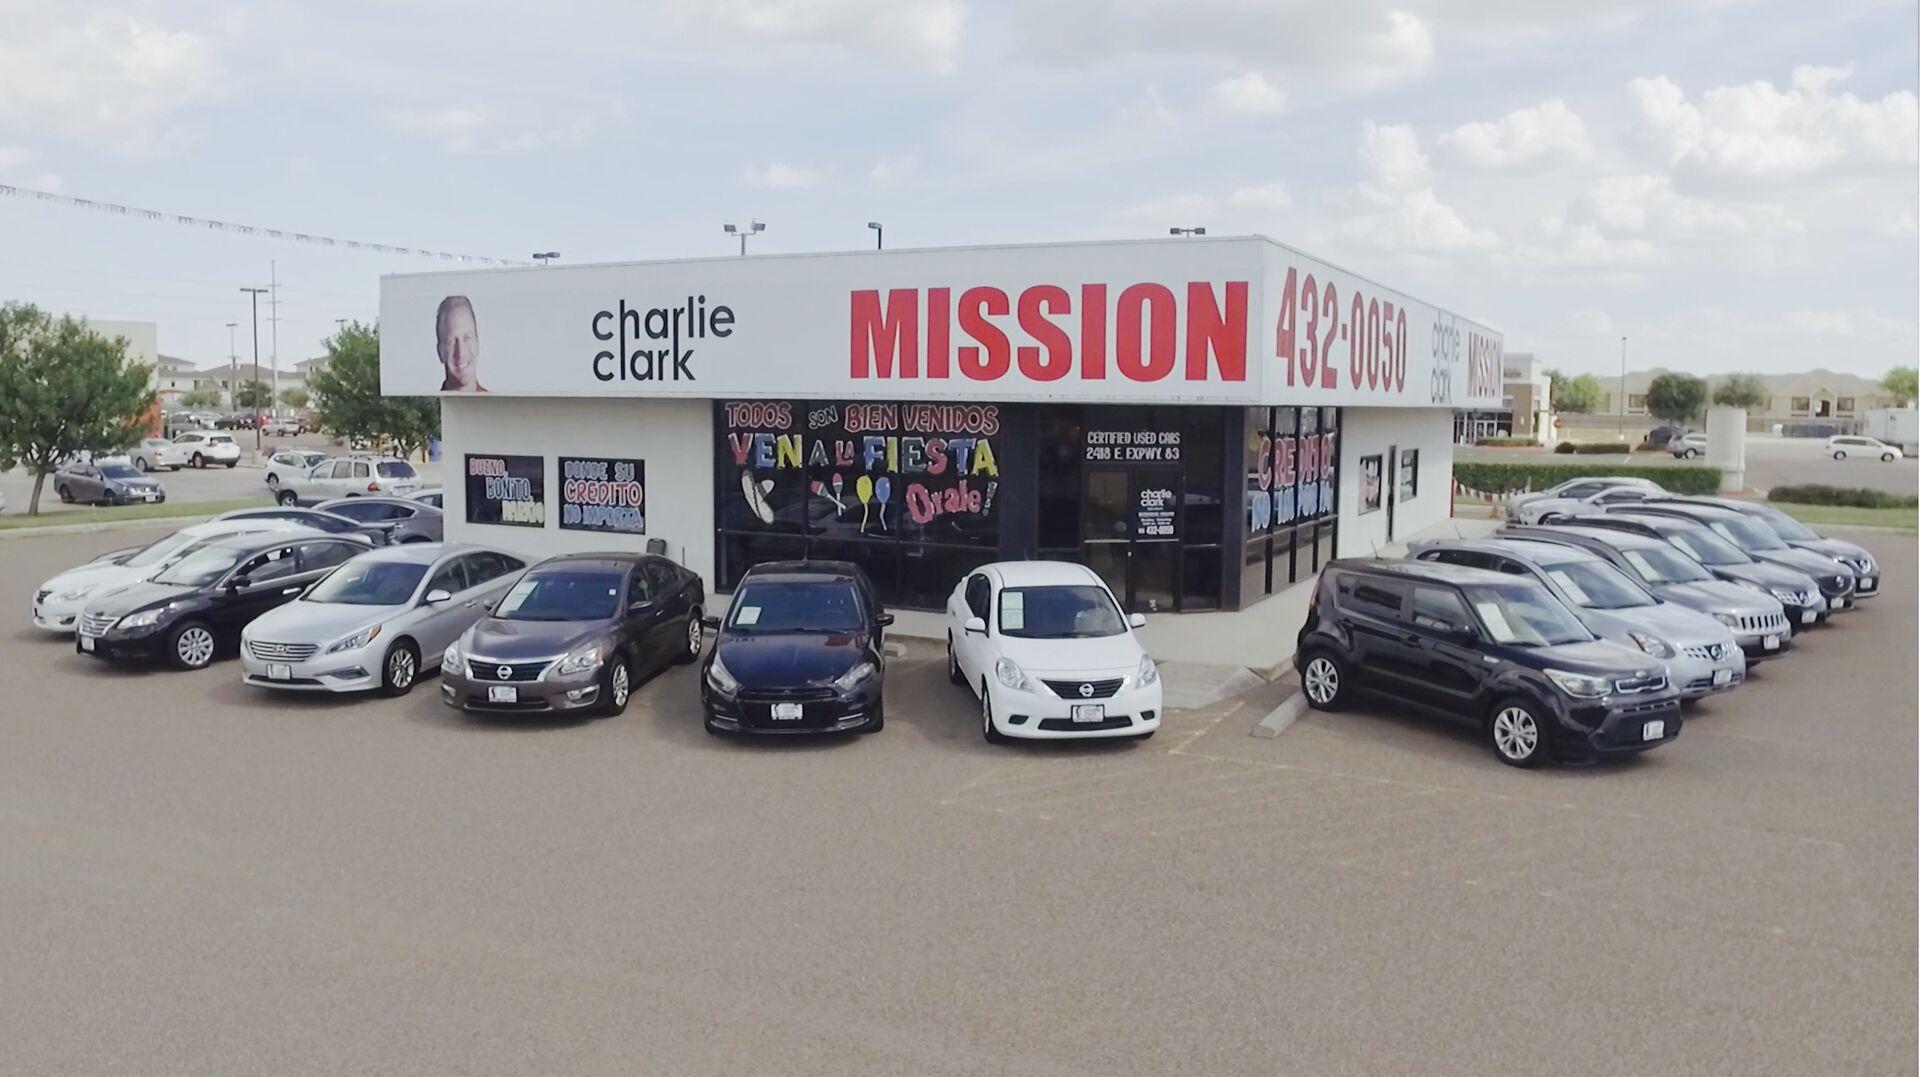 Used Car Dealership Mission Tx Charlie Clark Select Mission